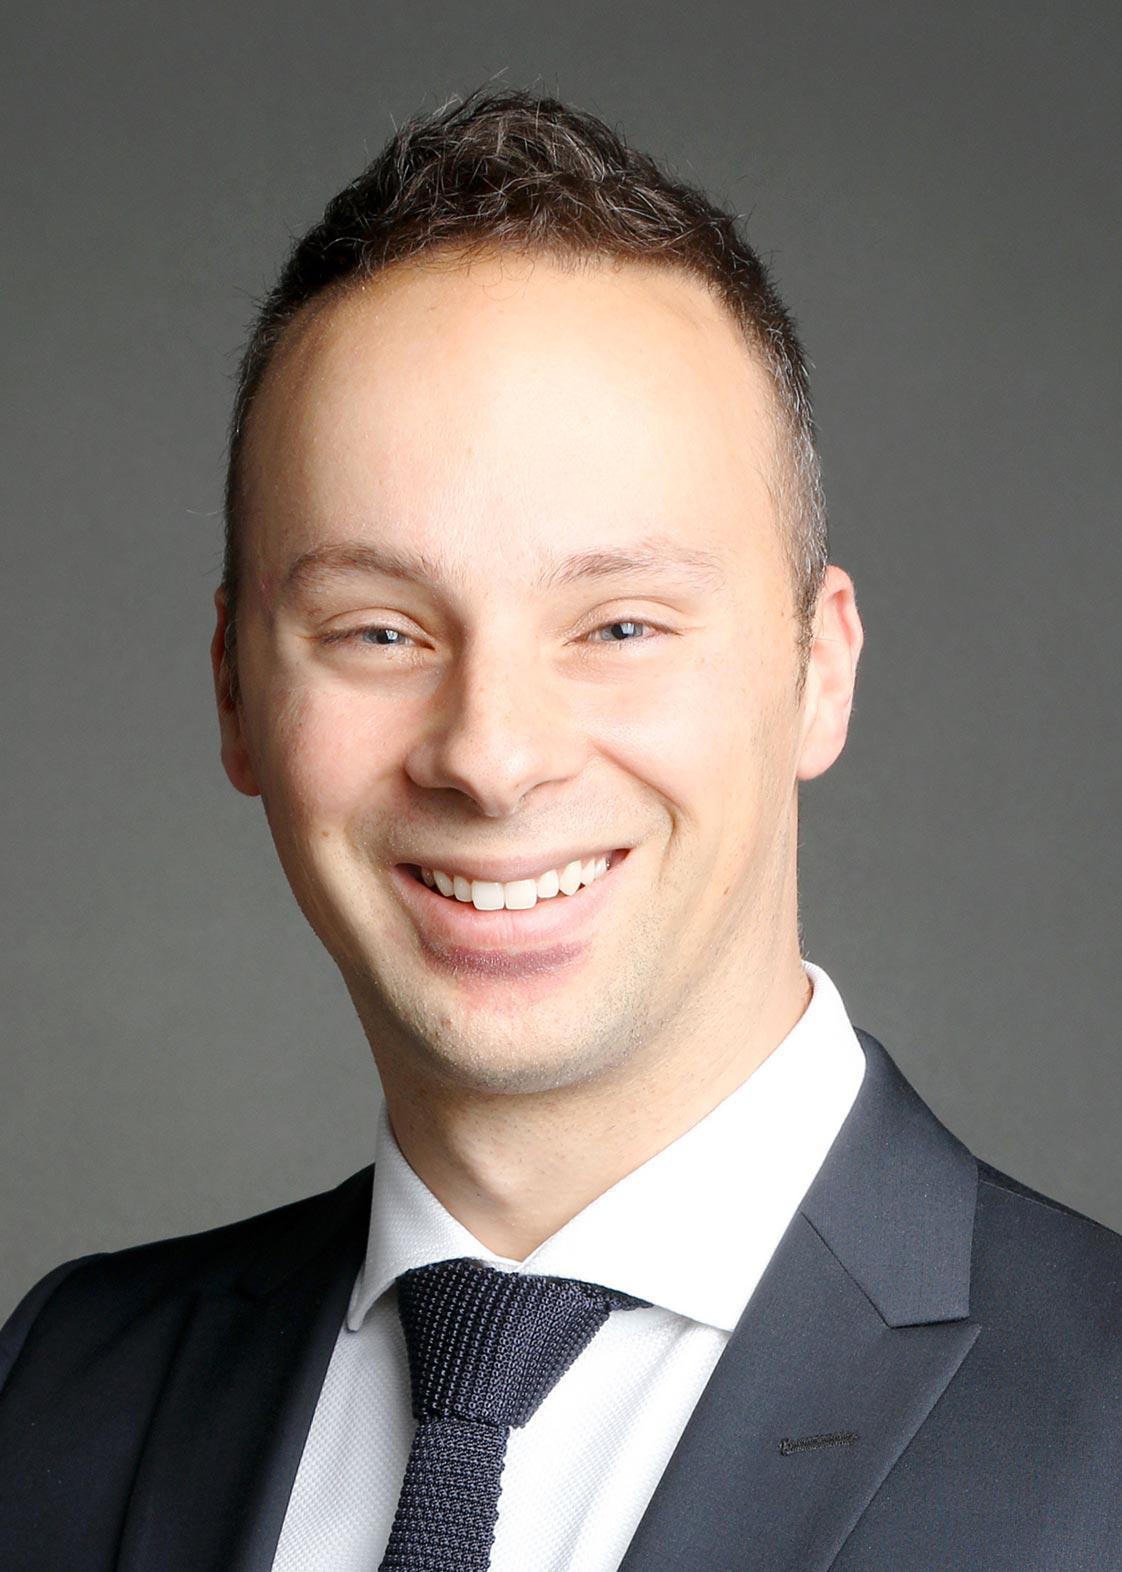 Jordan Vecchia - ScotiaMcLeod, Scotia Wealth Management